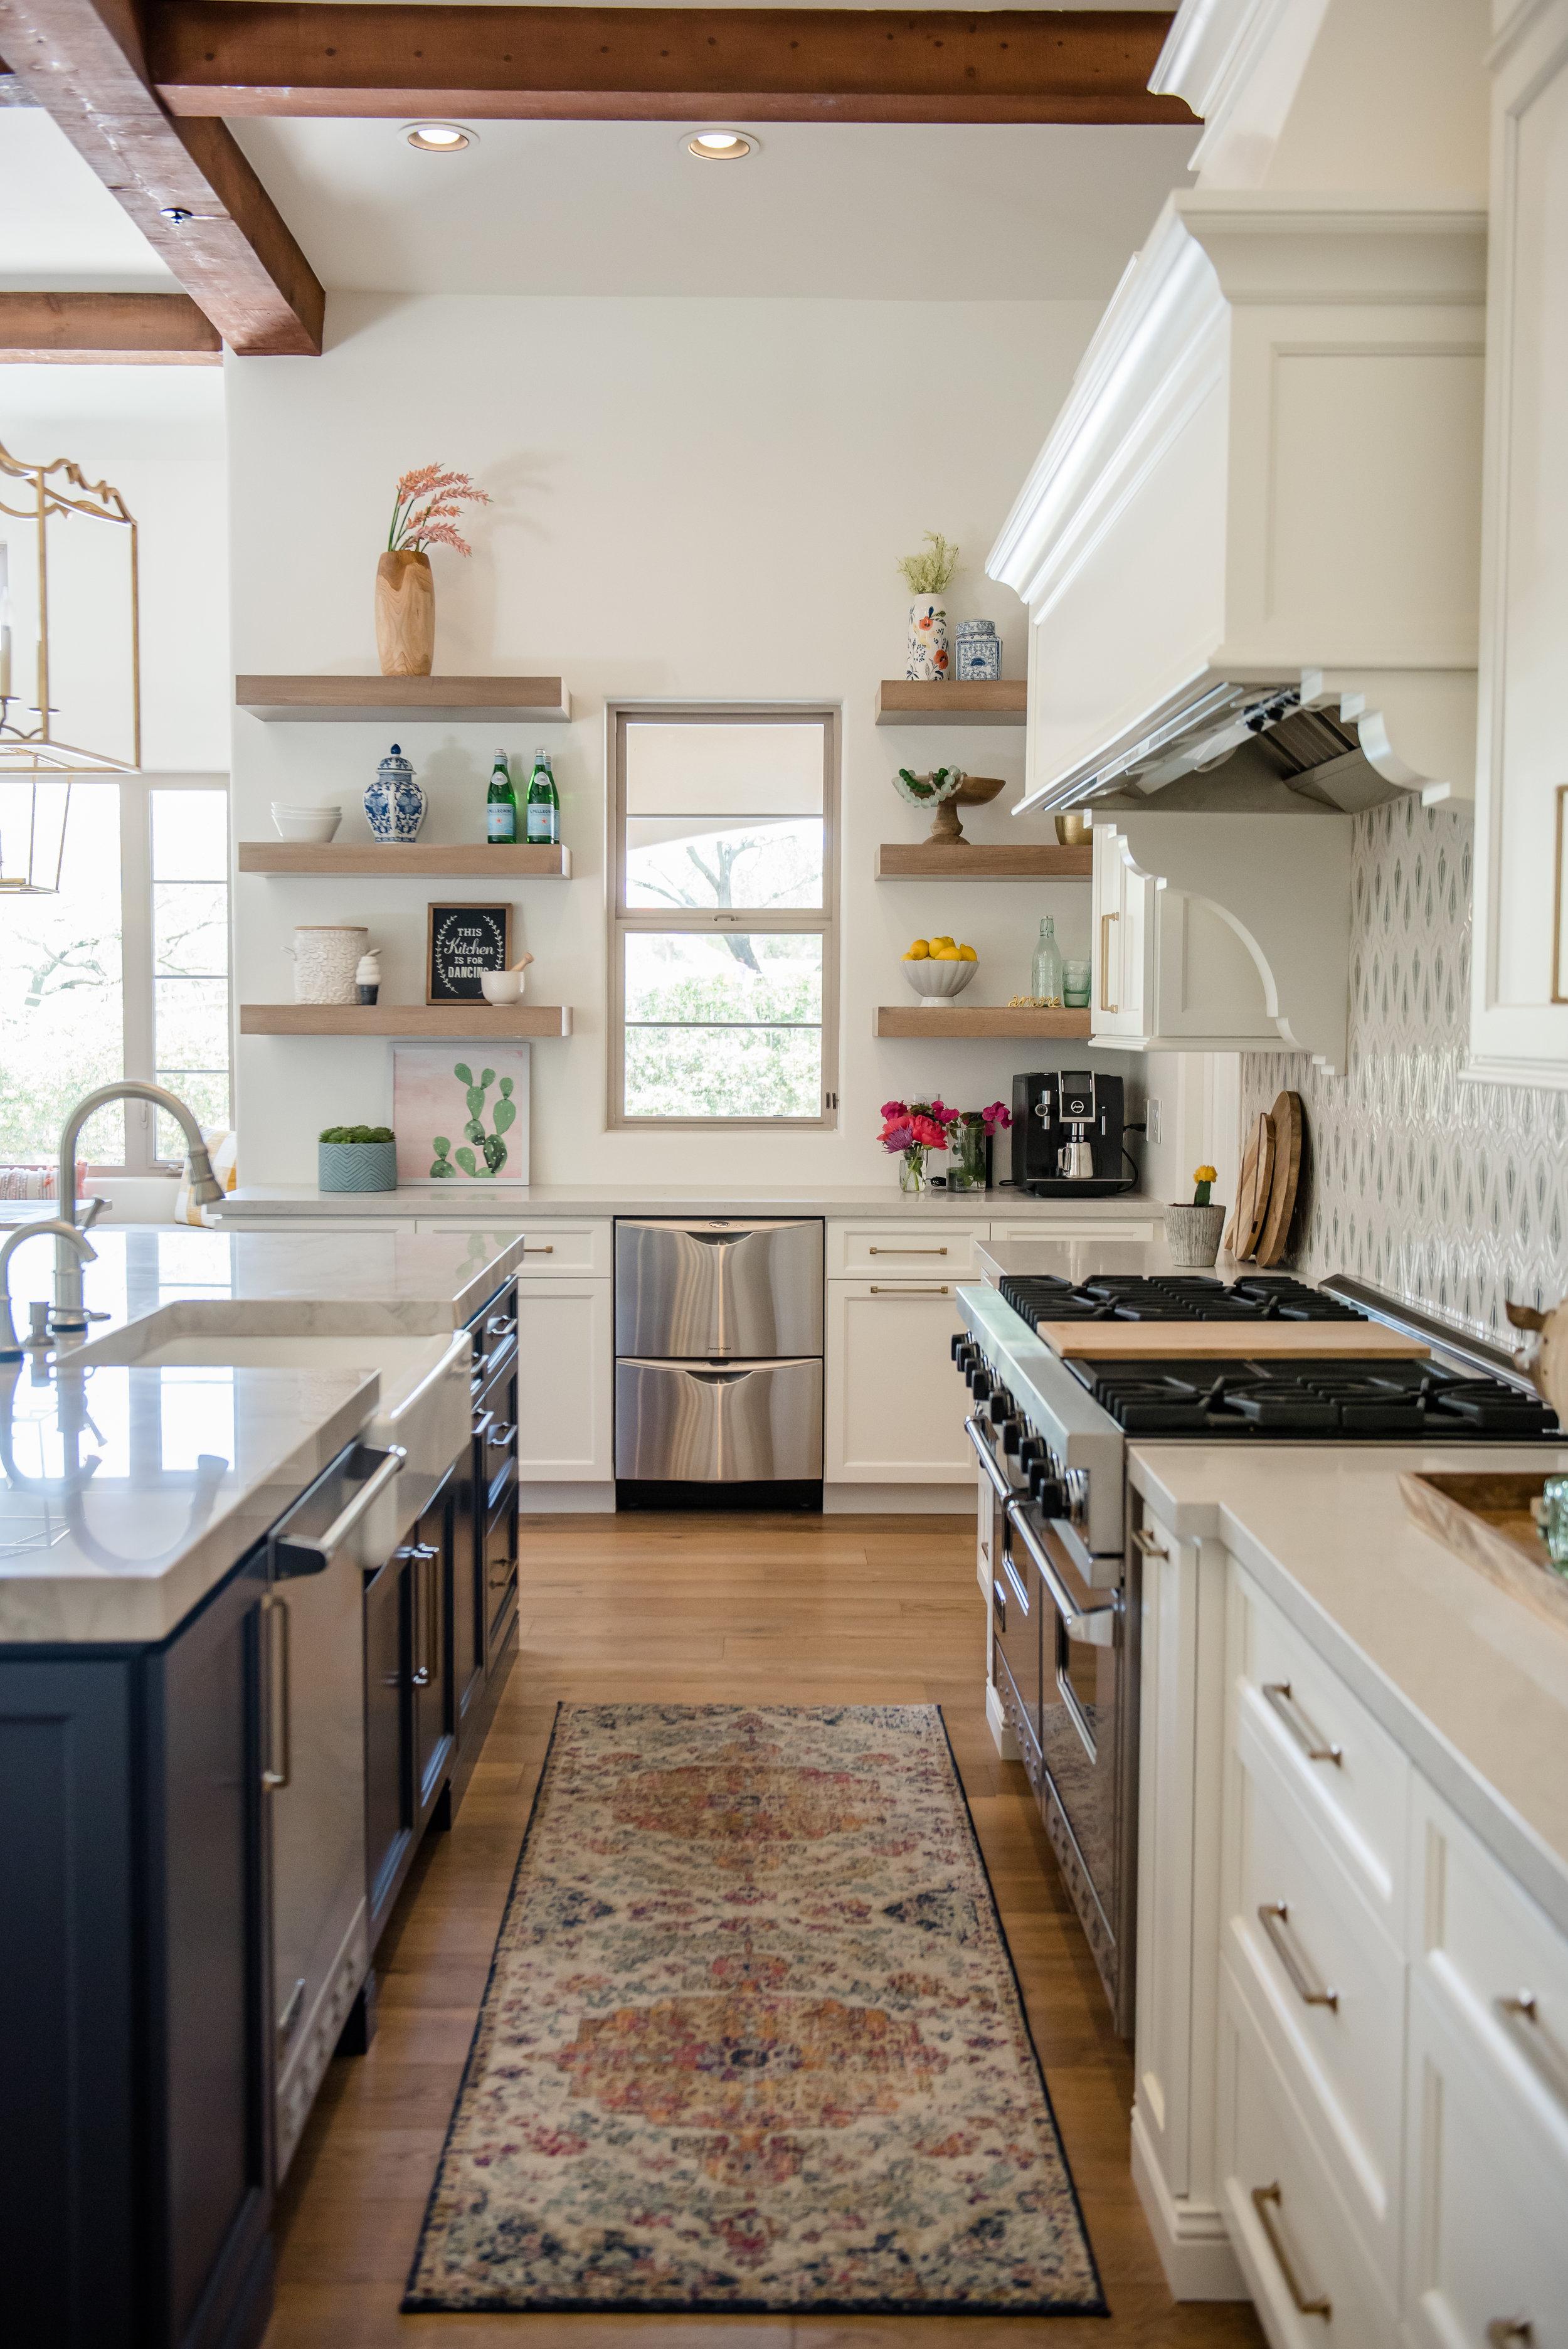 24+kitchen+hood+pots+stripedstools+navyblueisland+backsplashtile+openshelves+pendants+brasslighting.jpg